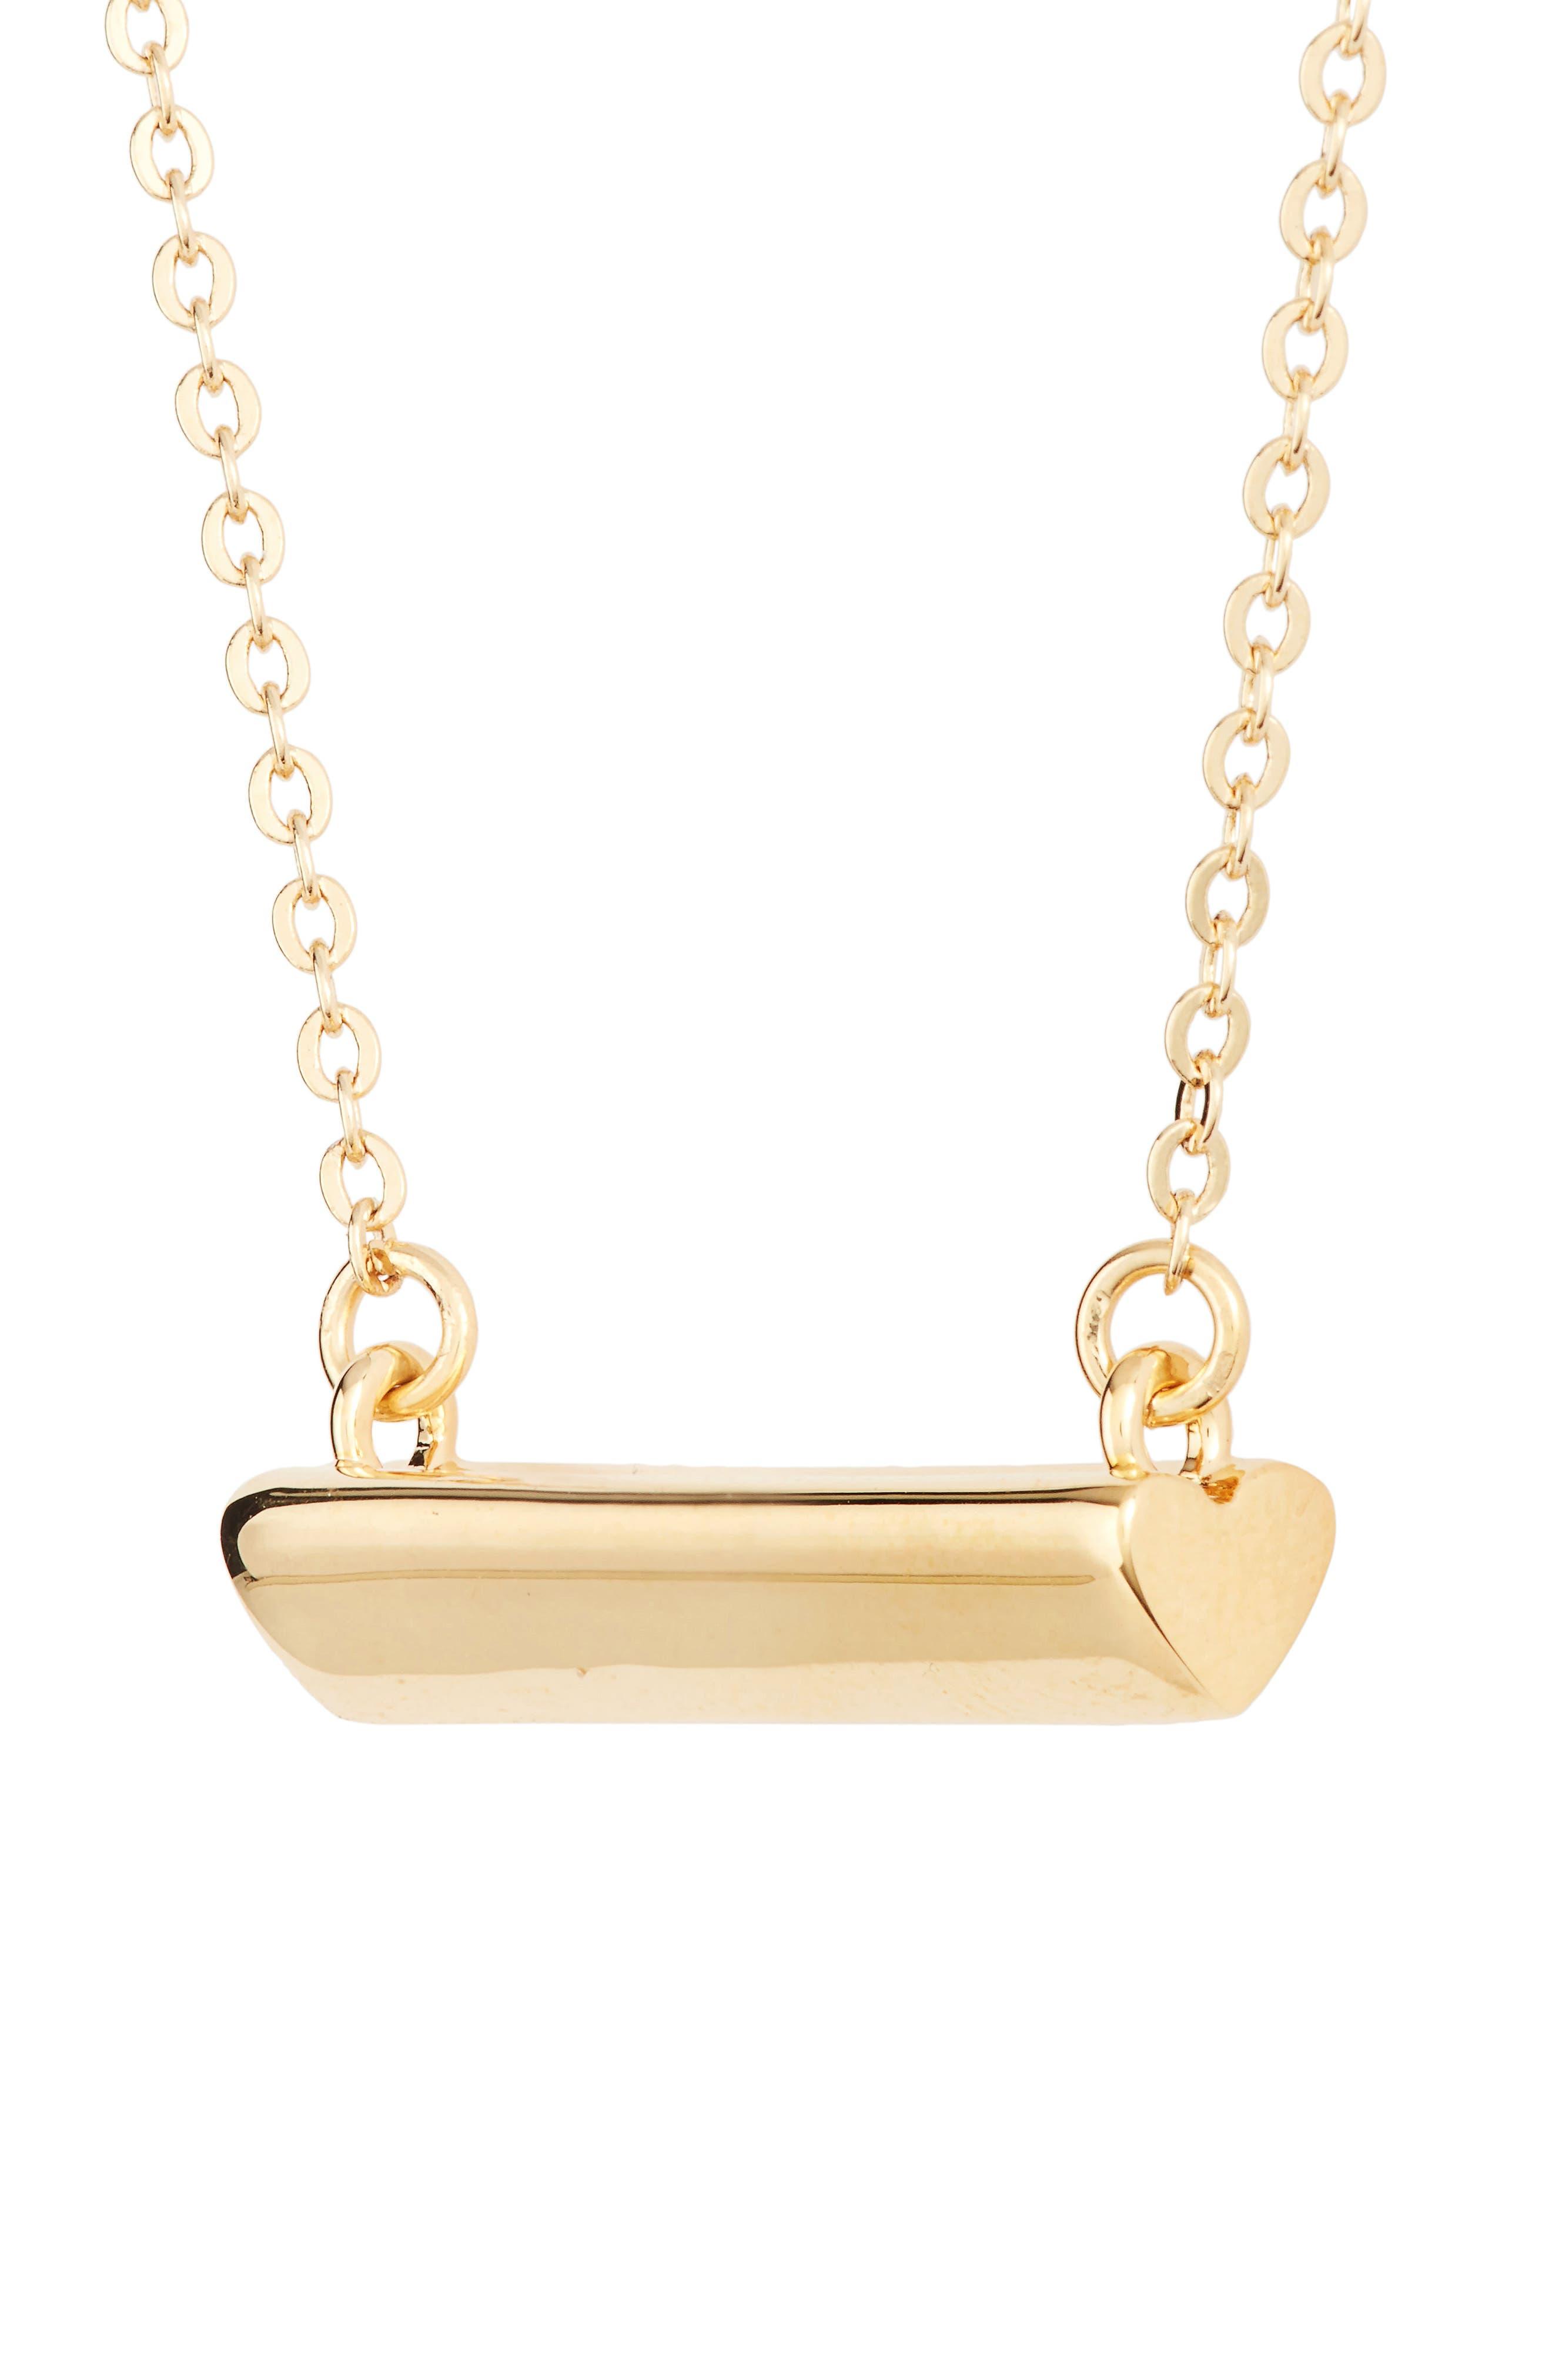 Heart Shaped Bar Pendant Necklace,                             Main thumbnail 1, color,                             Gold